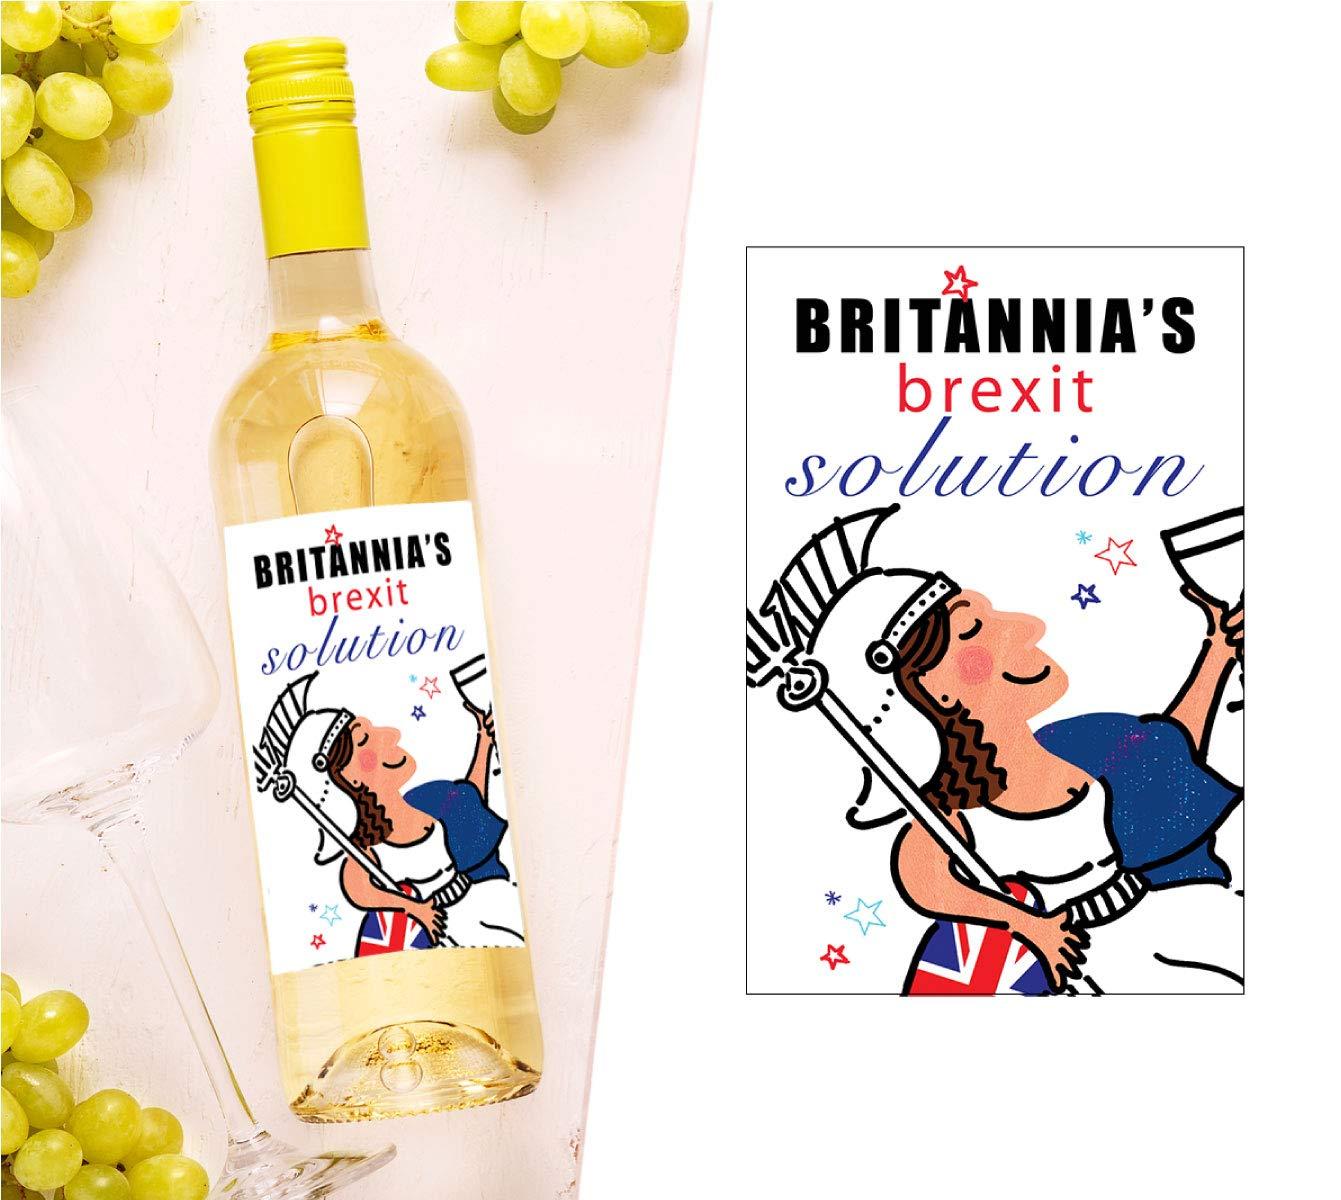 Brexit Wine Bottle Label Britannias Brexit Solution Funny Gift Present